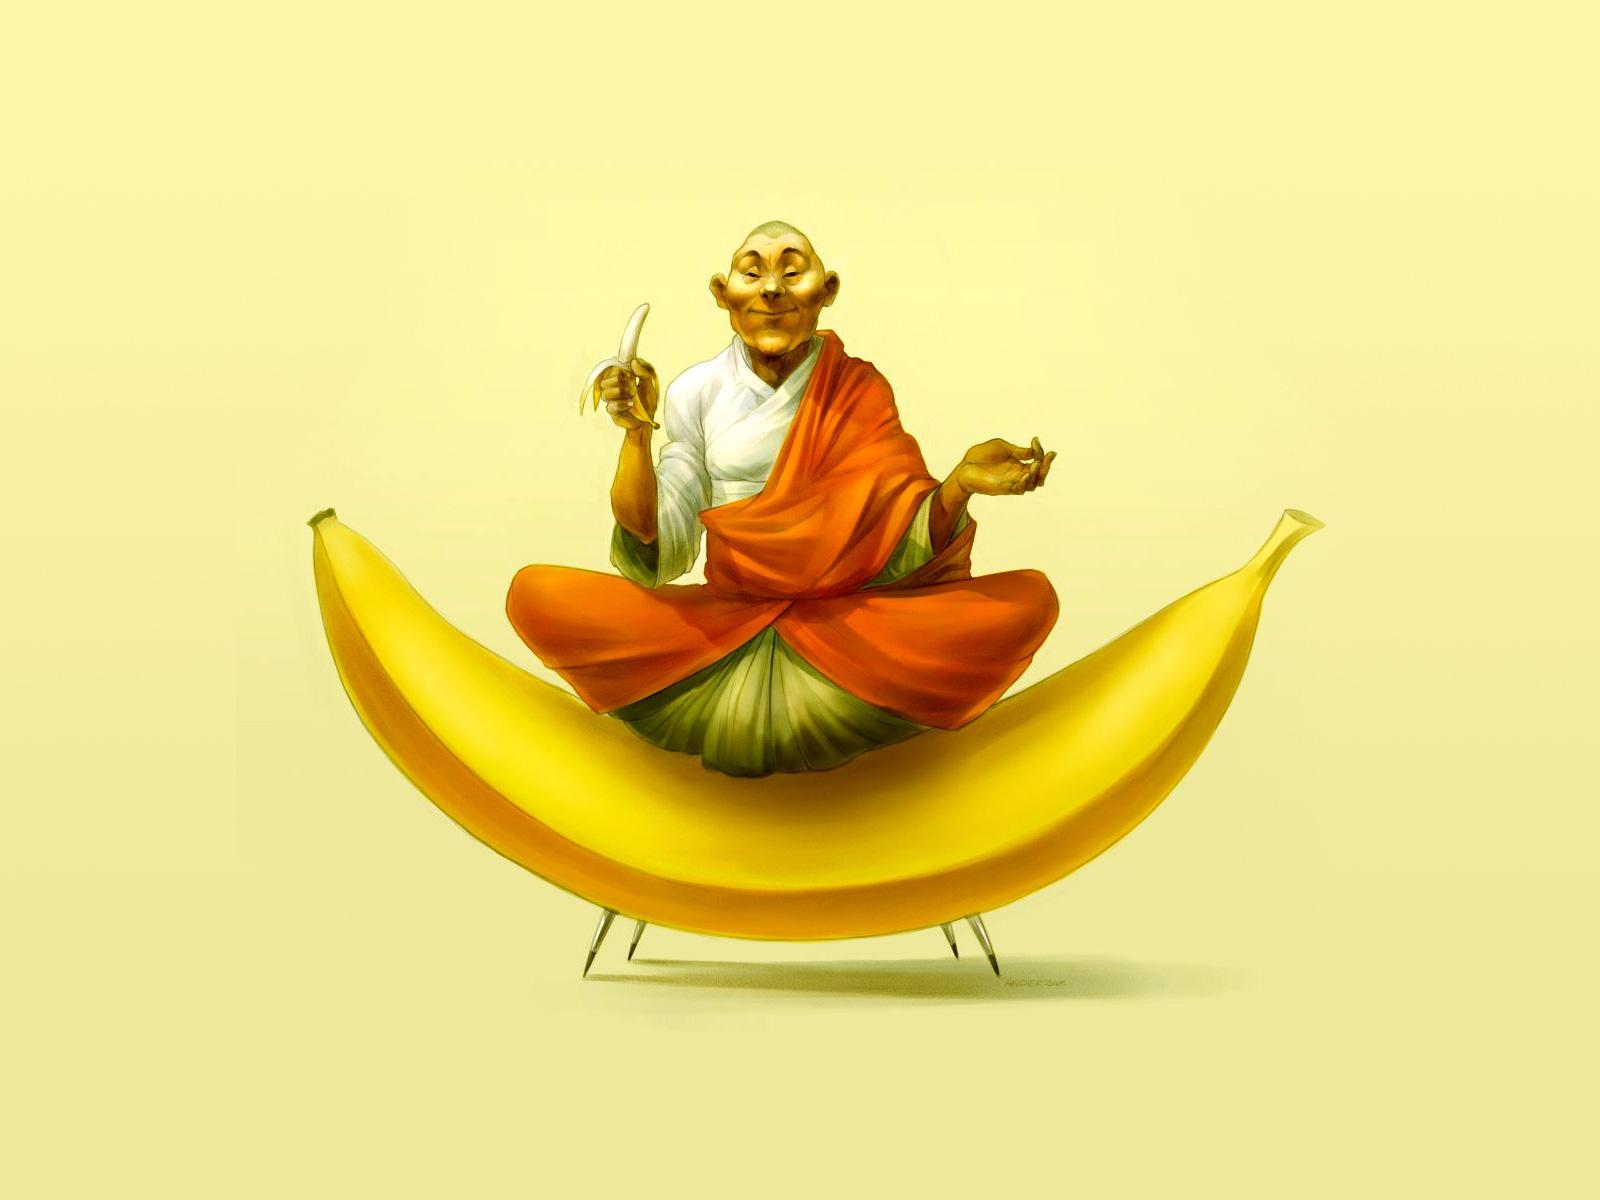 Image Result For Wallpaper Budha